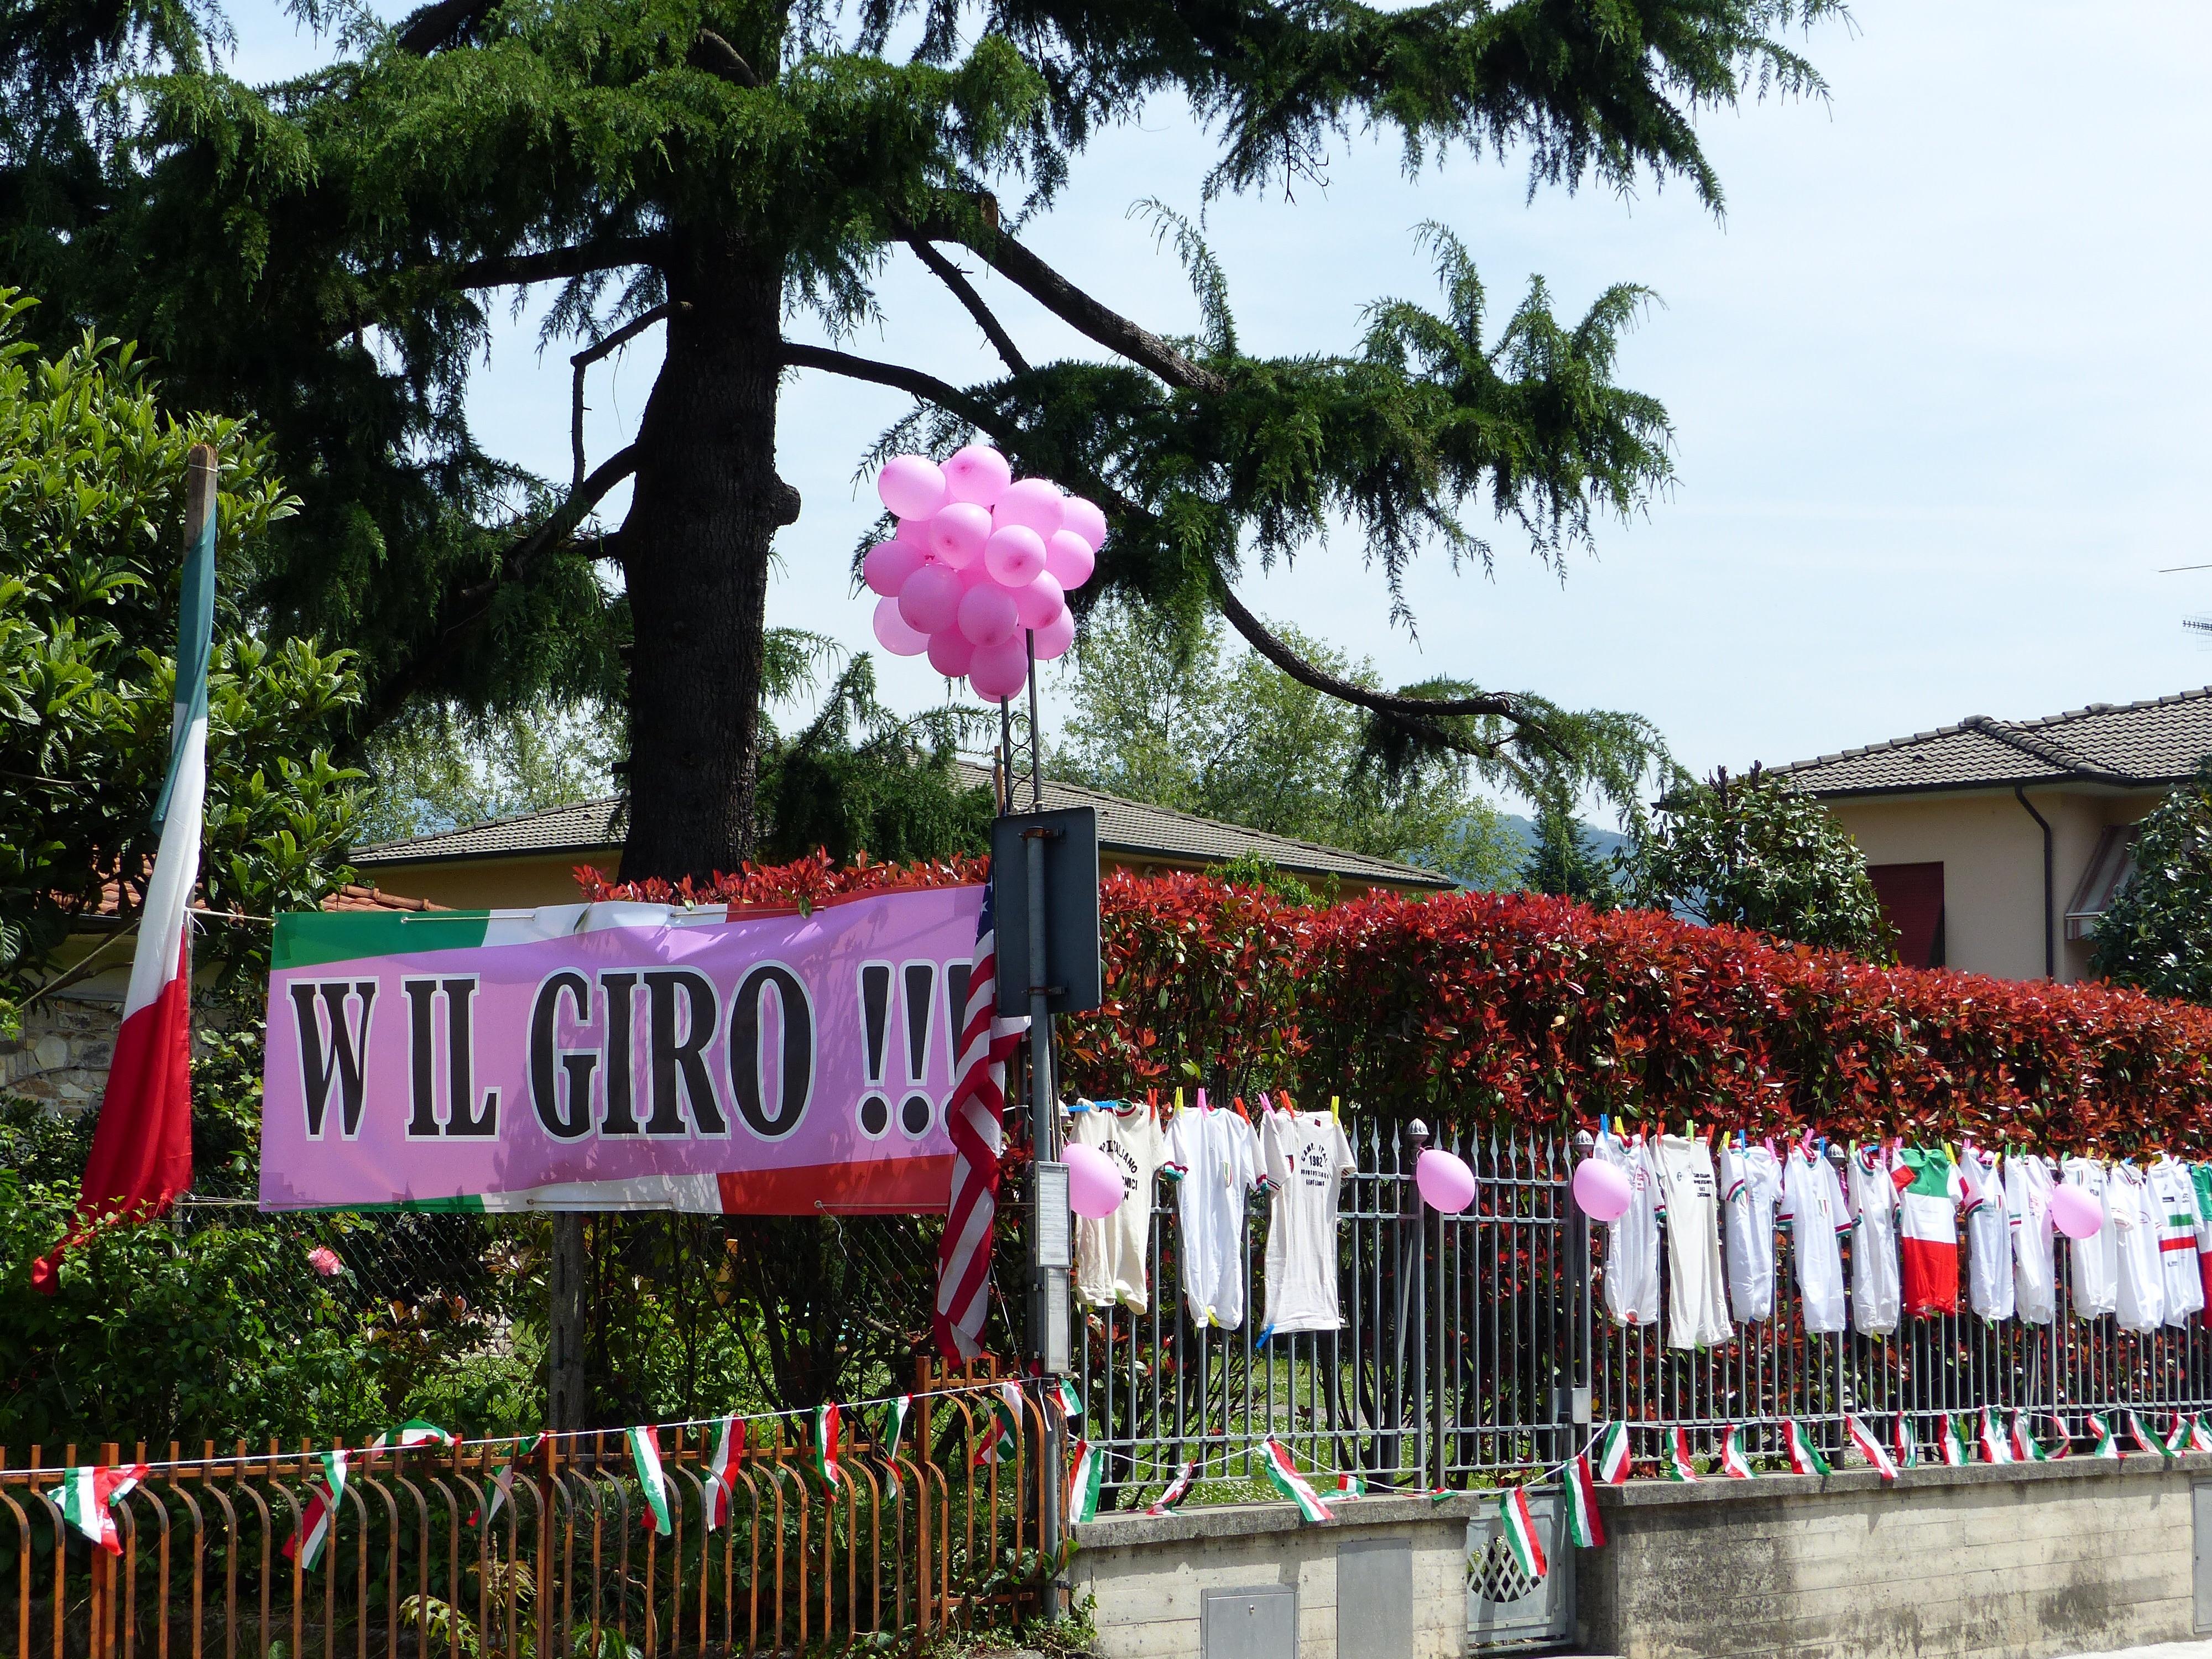 Giro d\'Italia comes to Bagni di Lucca | Bagni di Lucca and Beyond